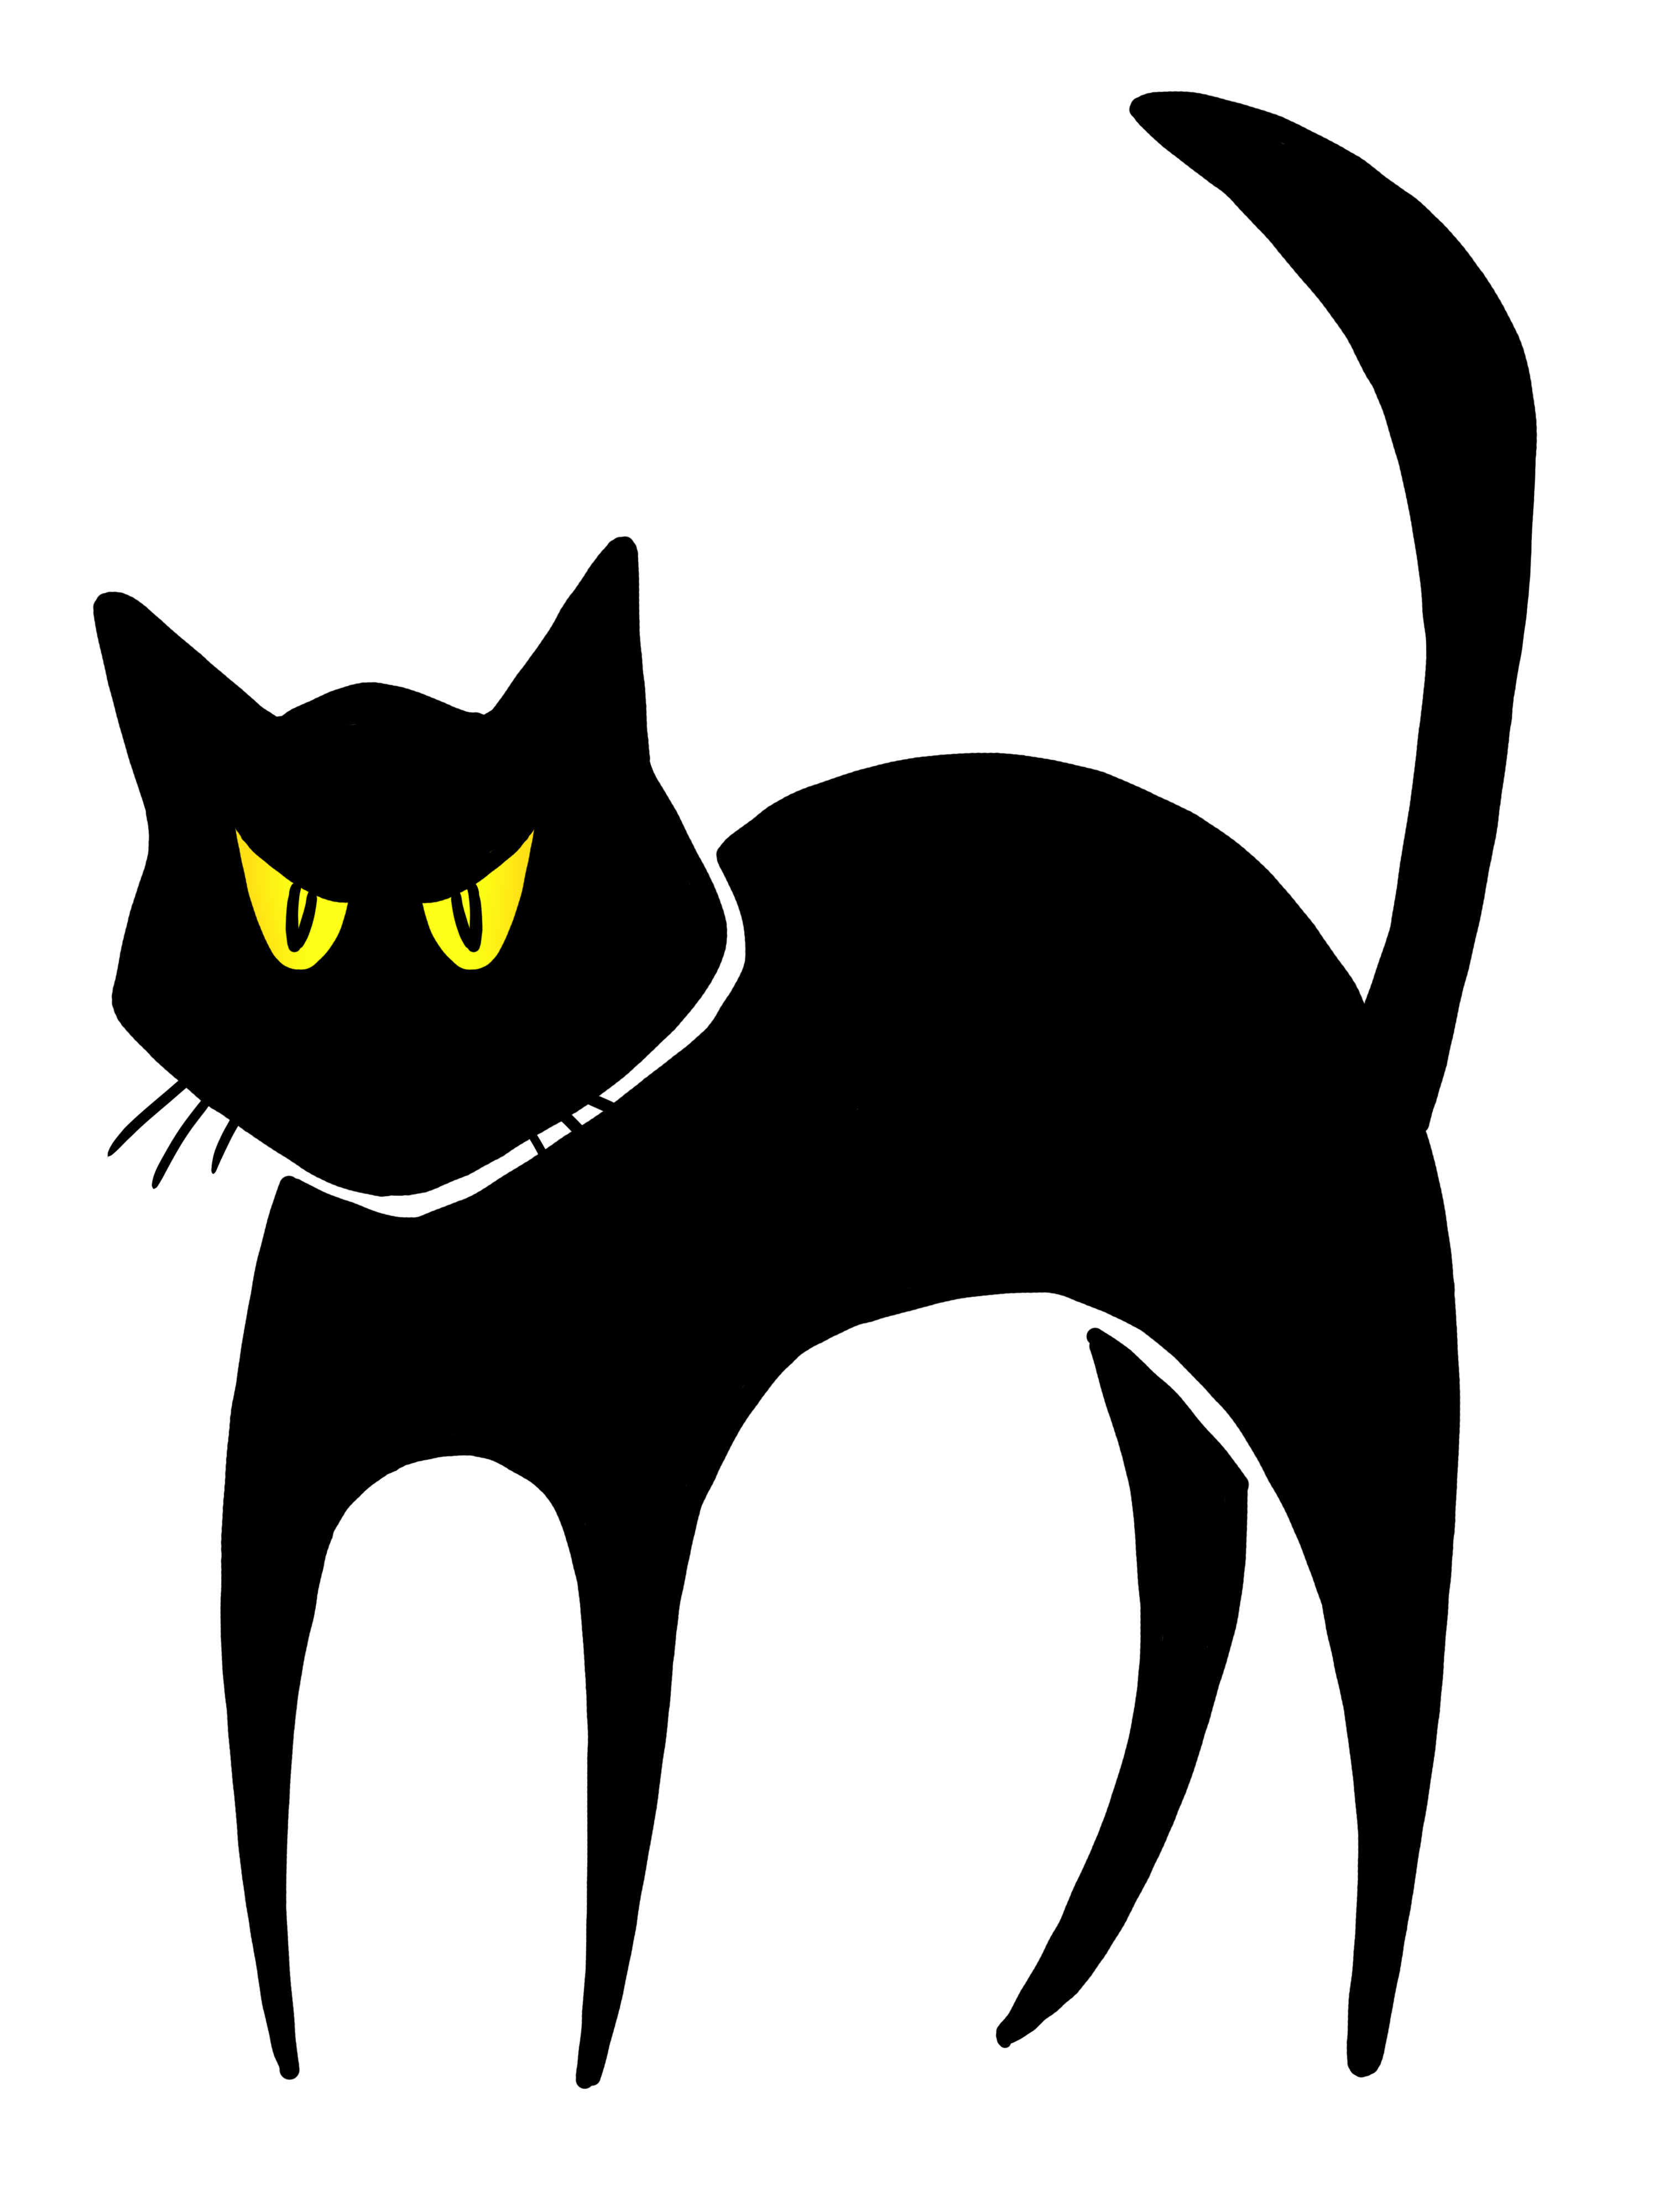 Black Cats Clip Art | Clipart Panda - Free Clipart Images